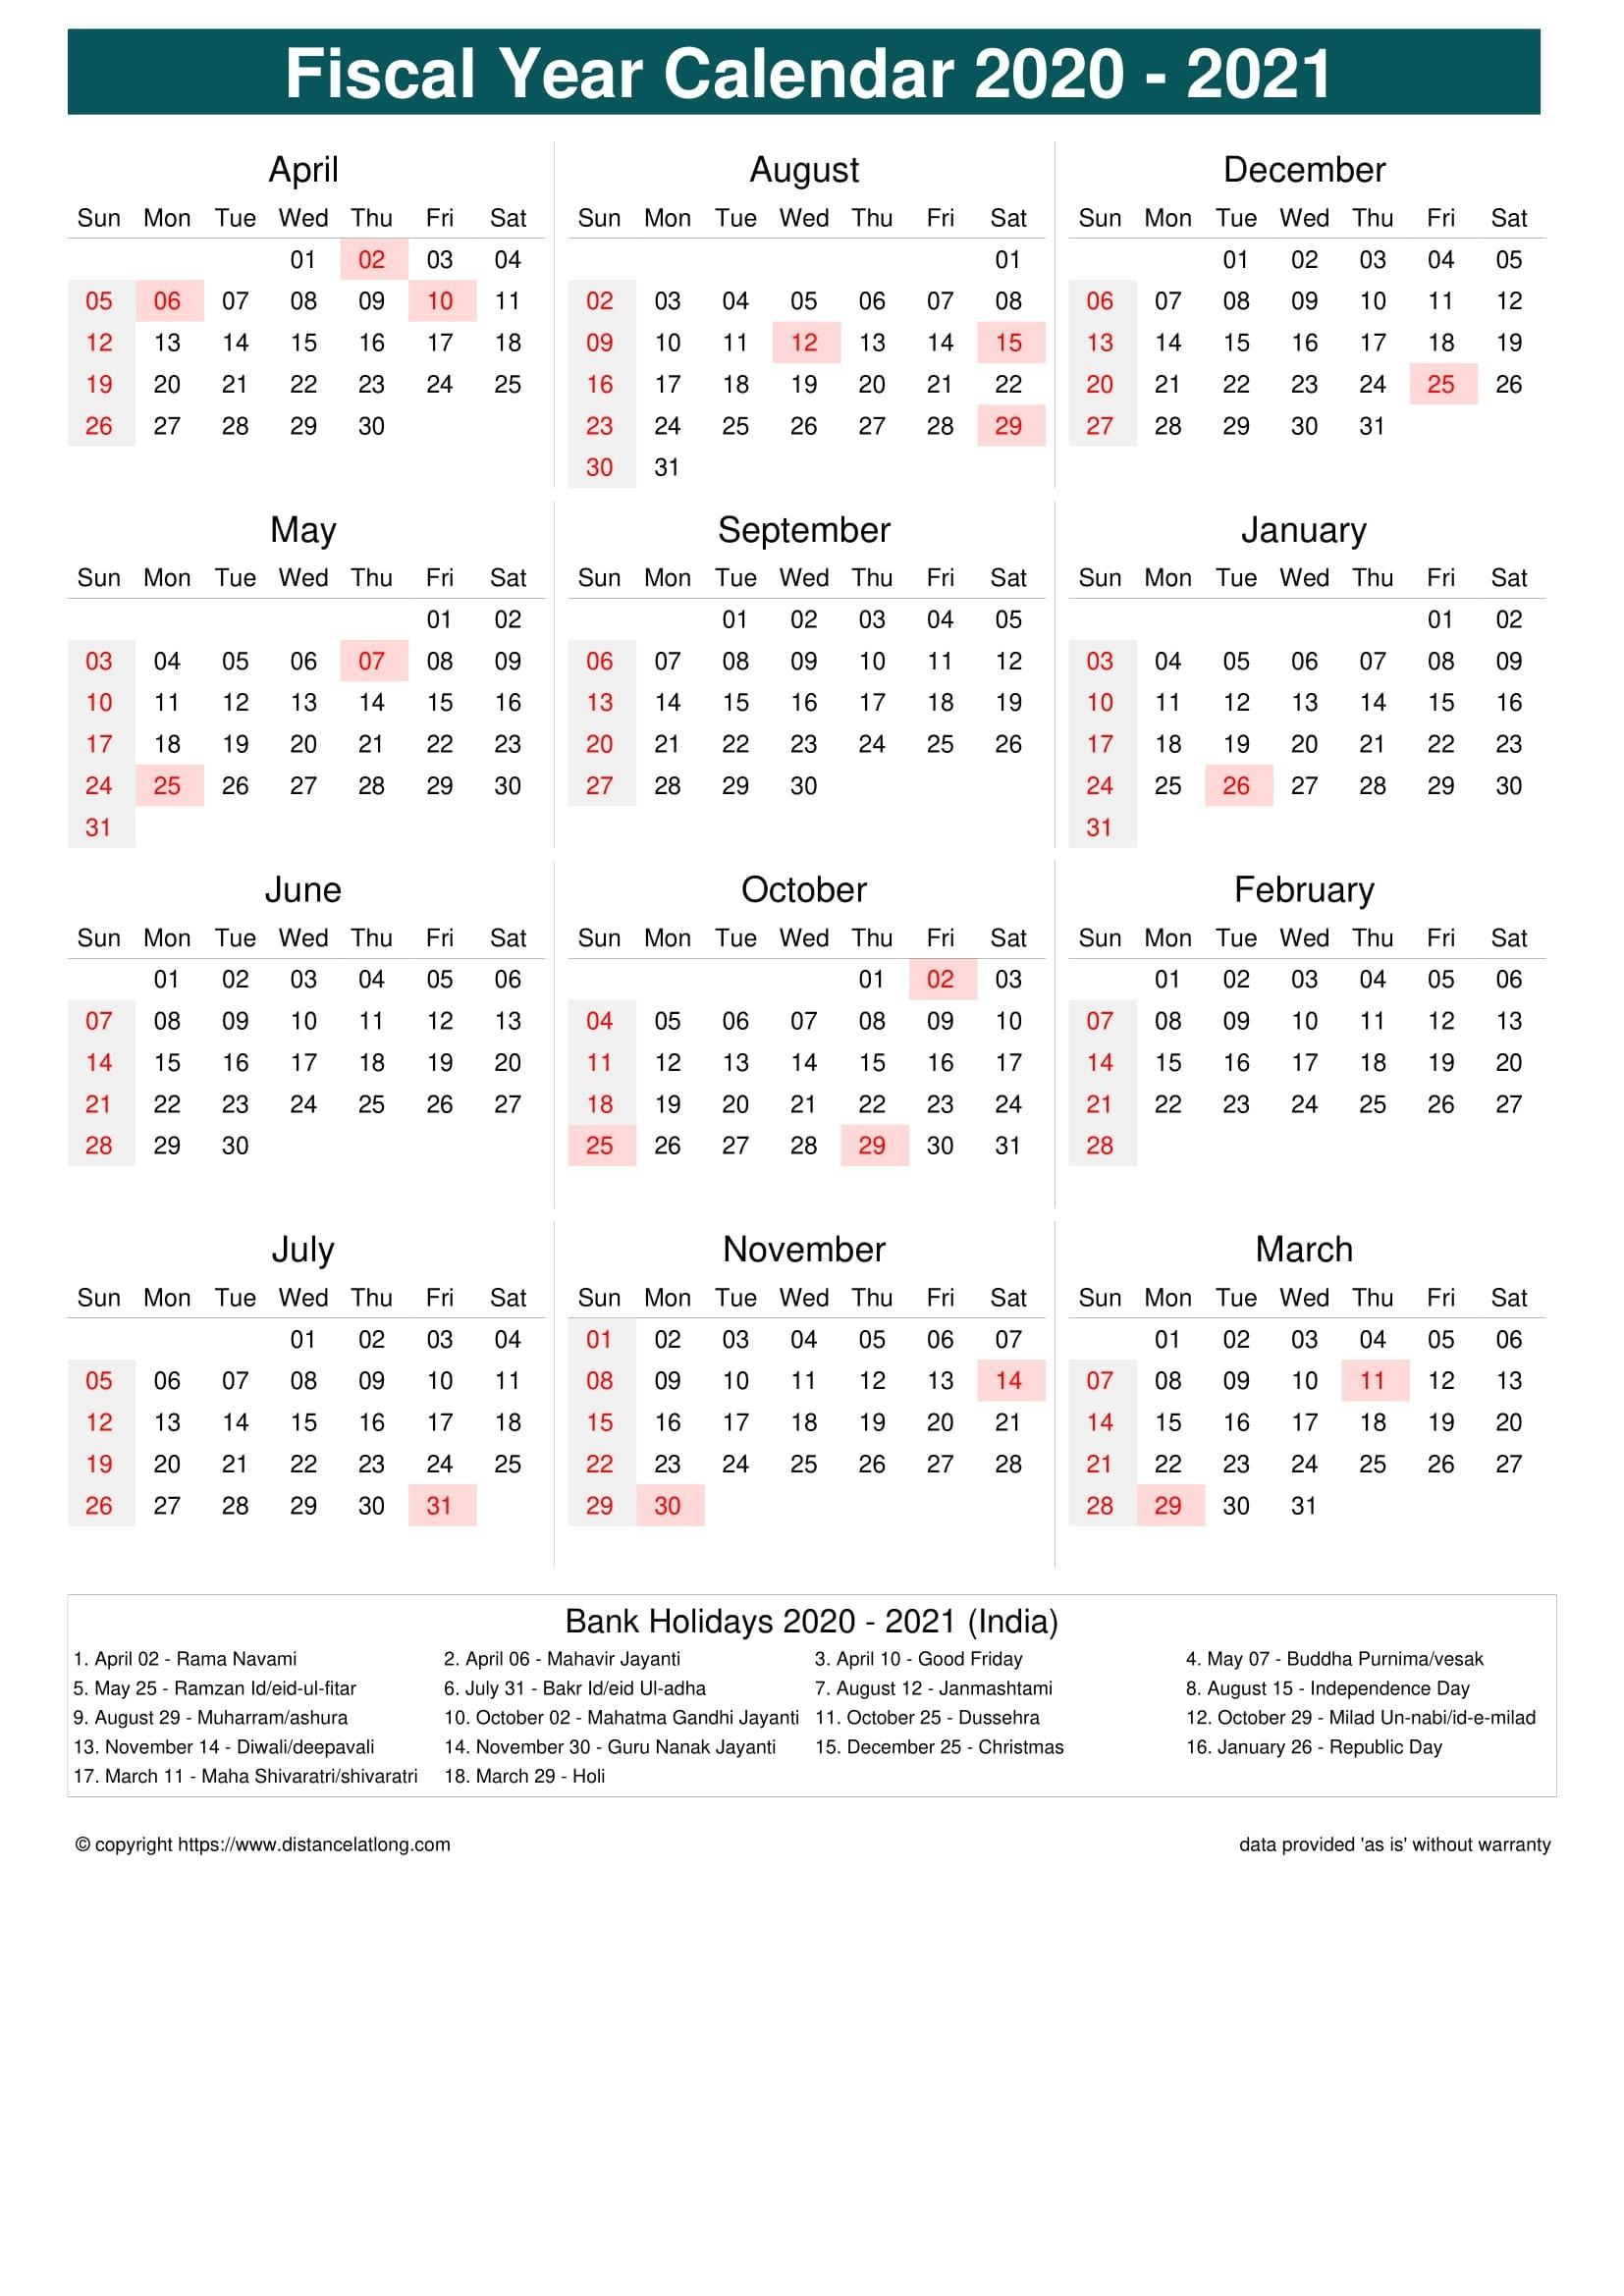 India Fiscal Year 2020-2021 Calendar Templates, Free